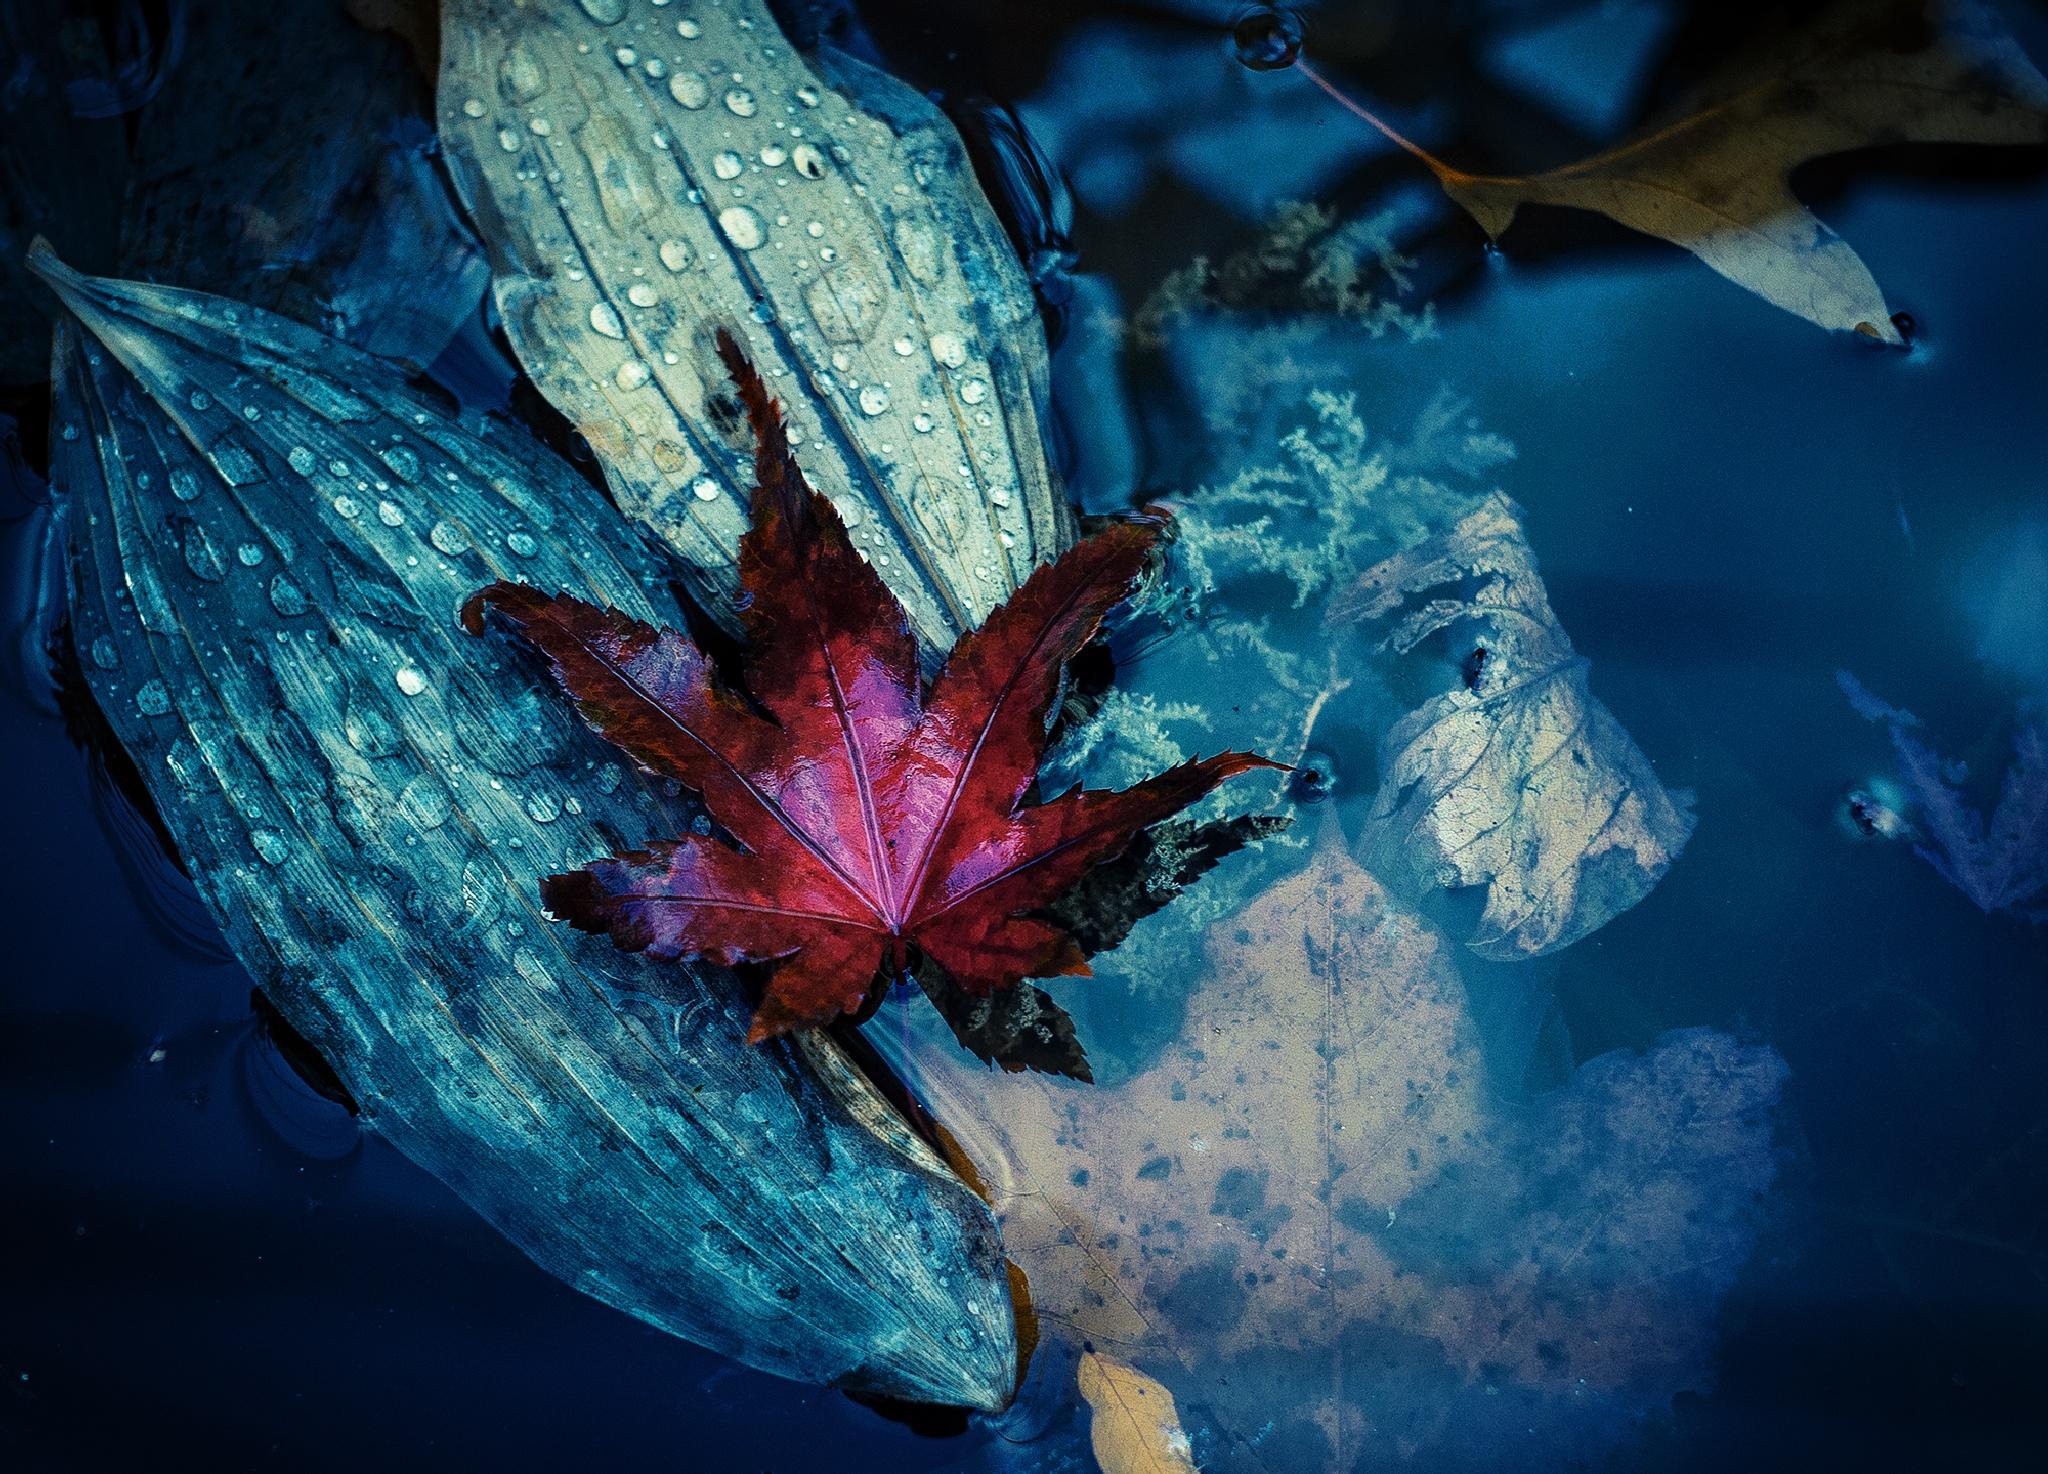 Red Leaf by JackNobre